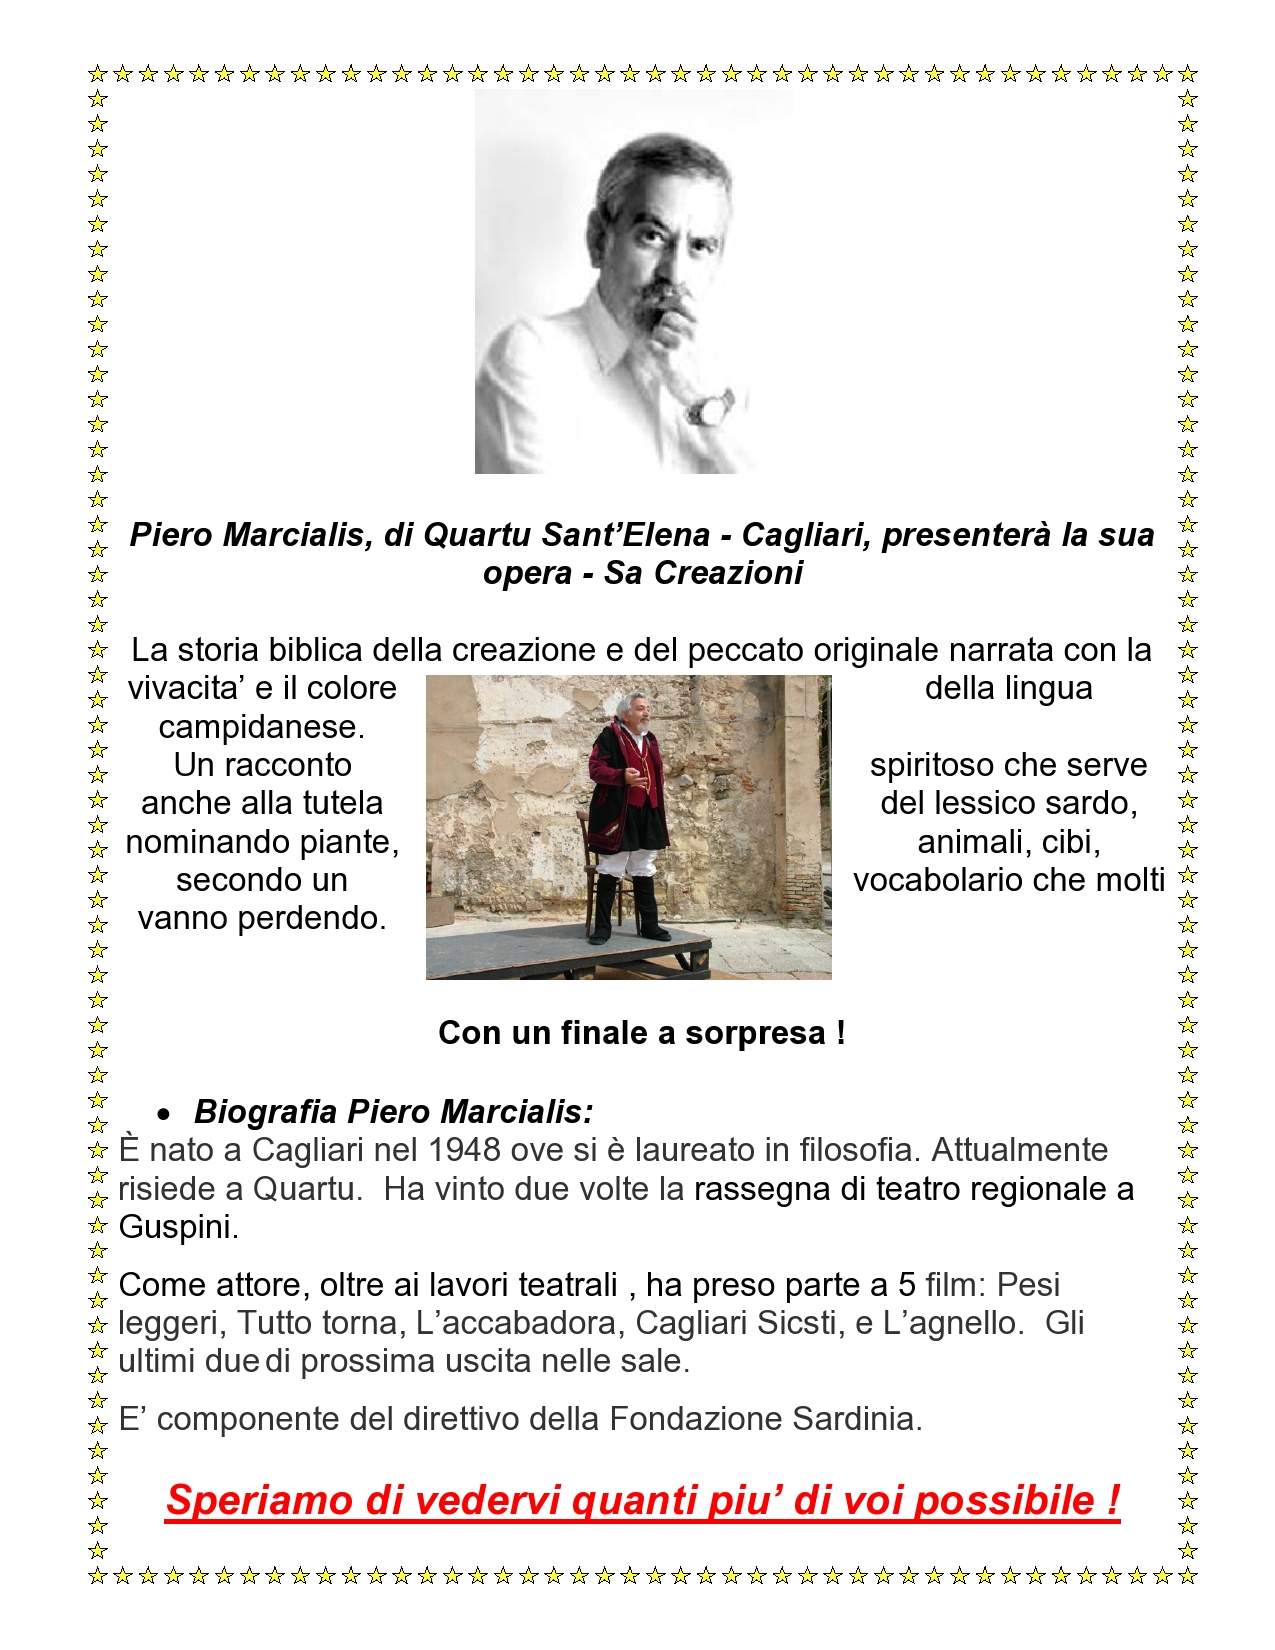 SCA Bullettin Visita Piero Marcialis-page0002.jpg